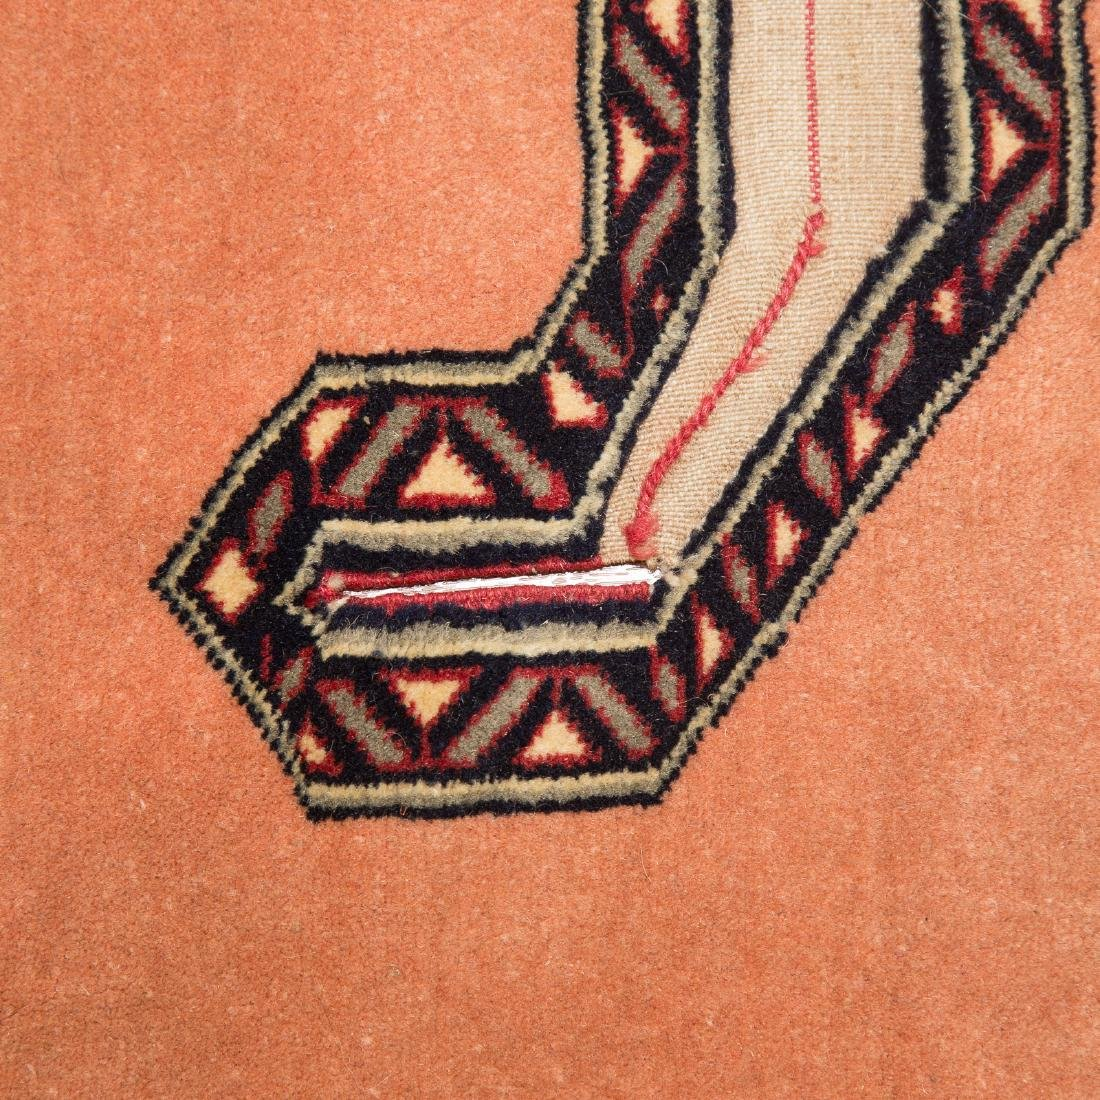 Persian Turkemon rug, approx. 3.7 x 4.3 - 3